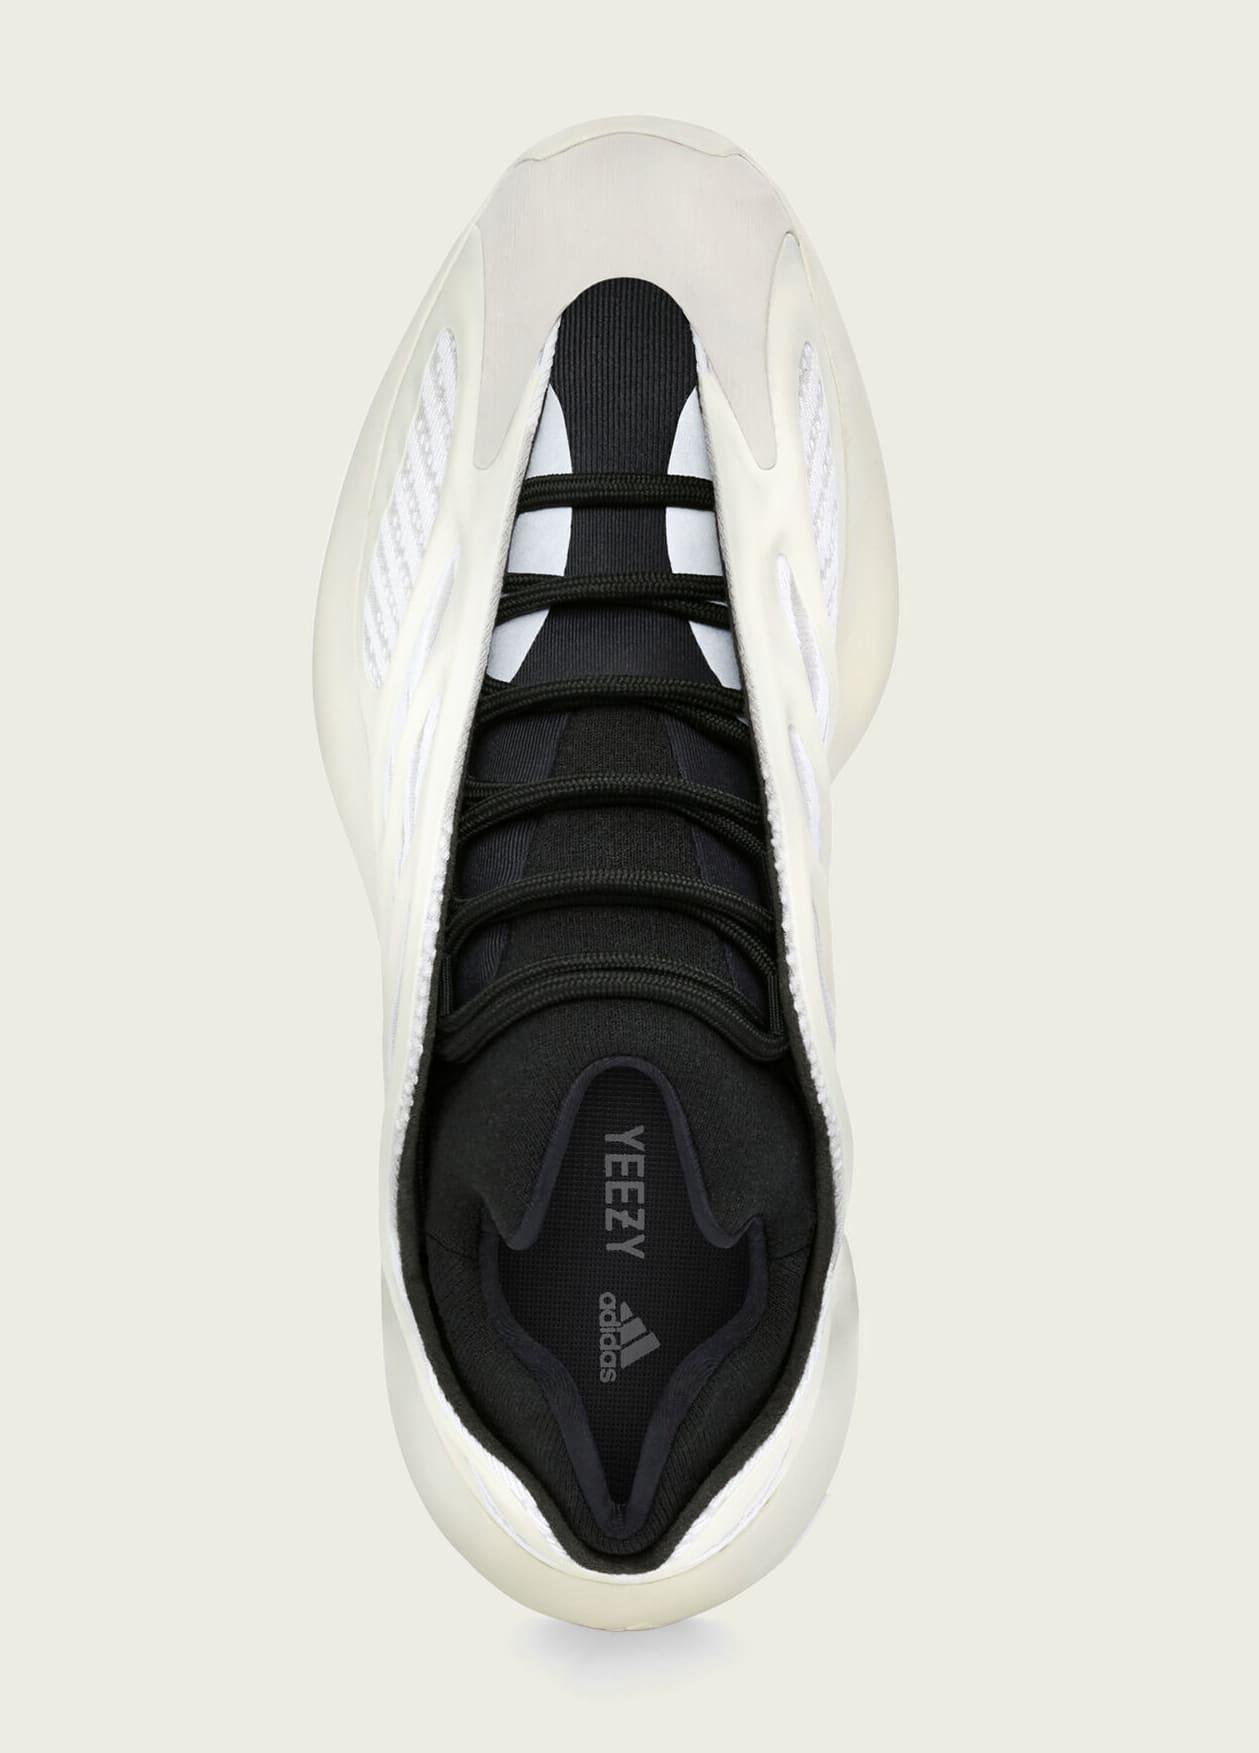 adidas-yeezy-boost-700-v3-azael-fw4980-top